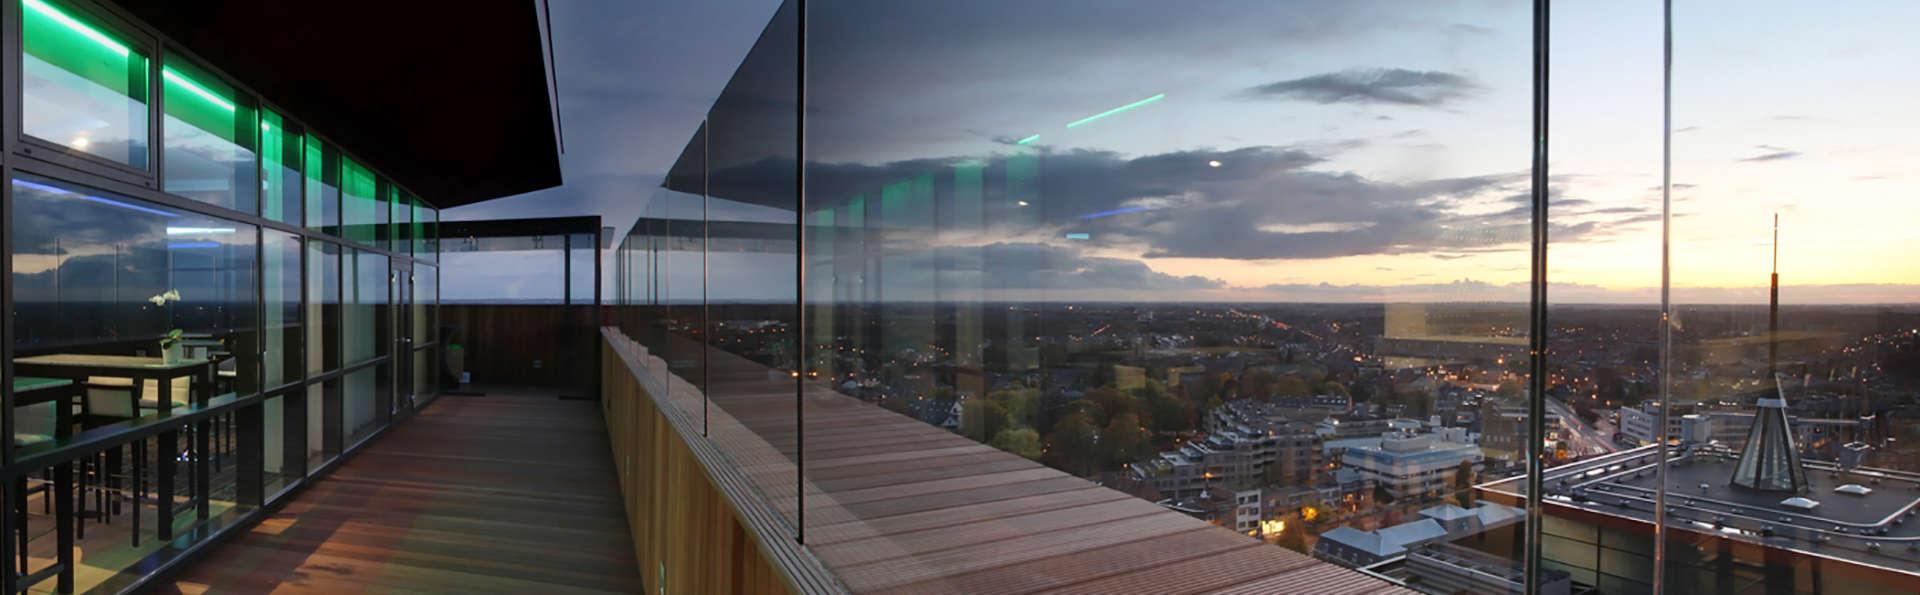 Radisson Blu Hotel Hasselt  - EDIT_Sky_Lounge_persbericht_Creneau.jpg